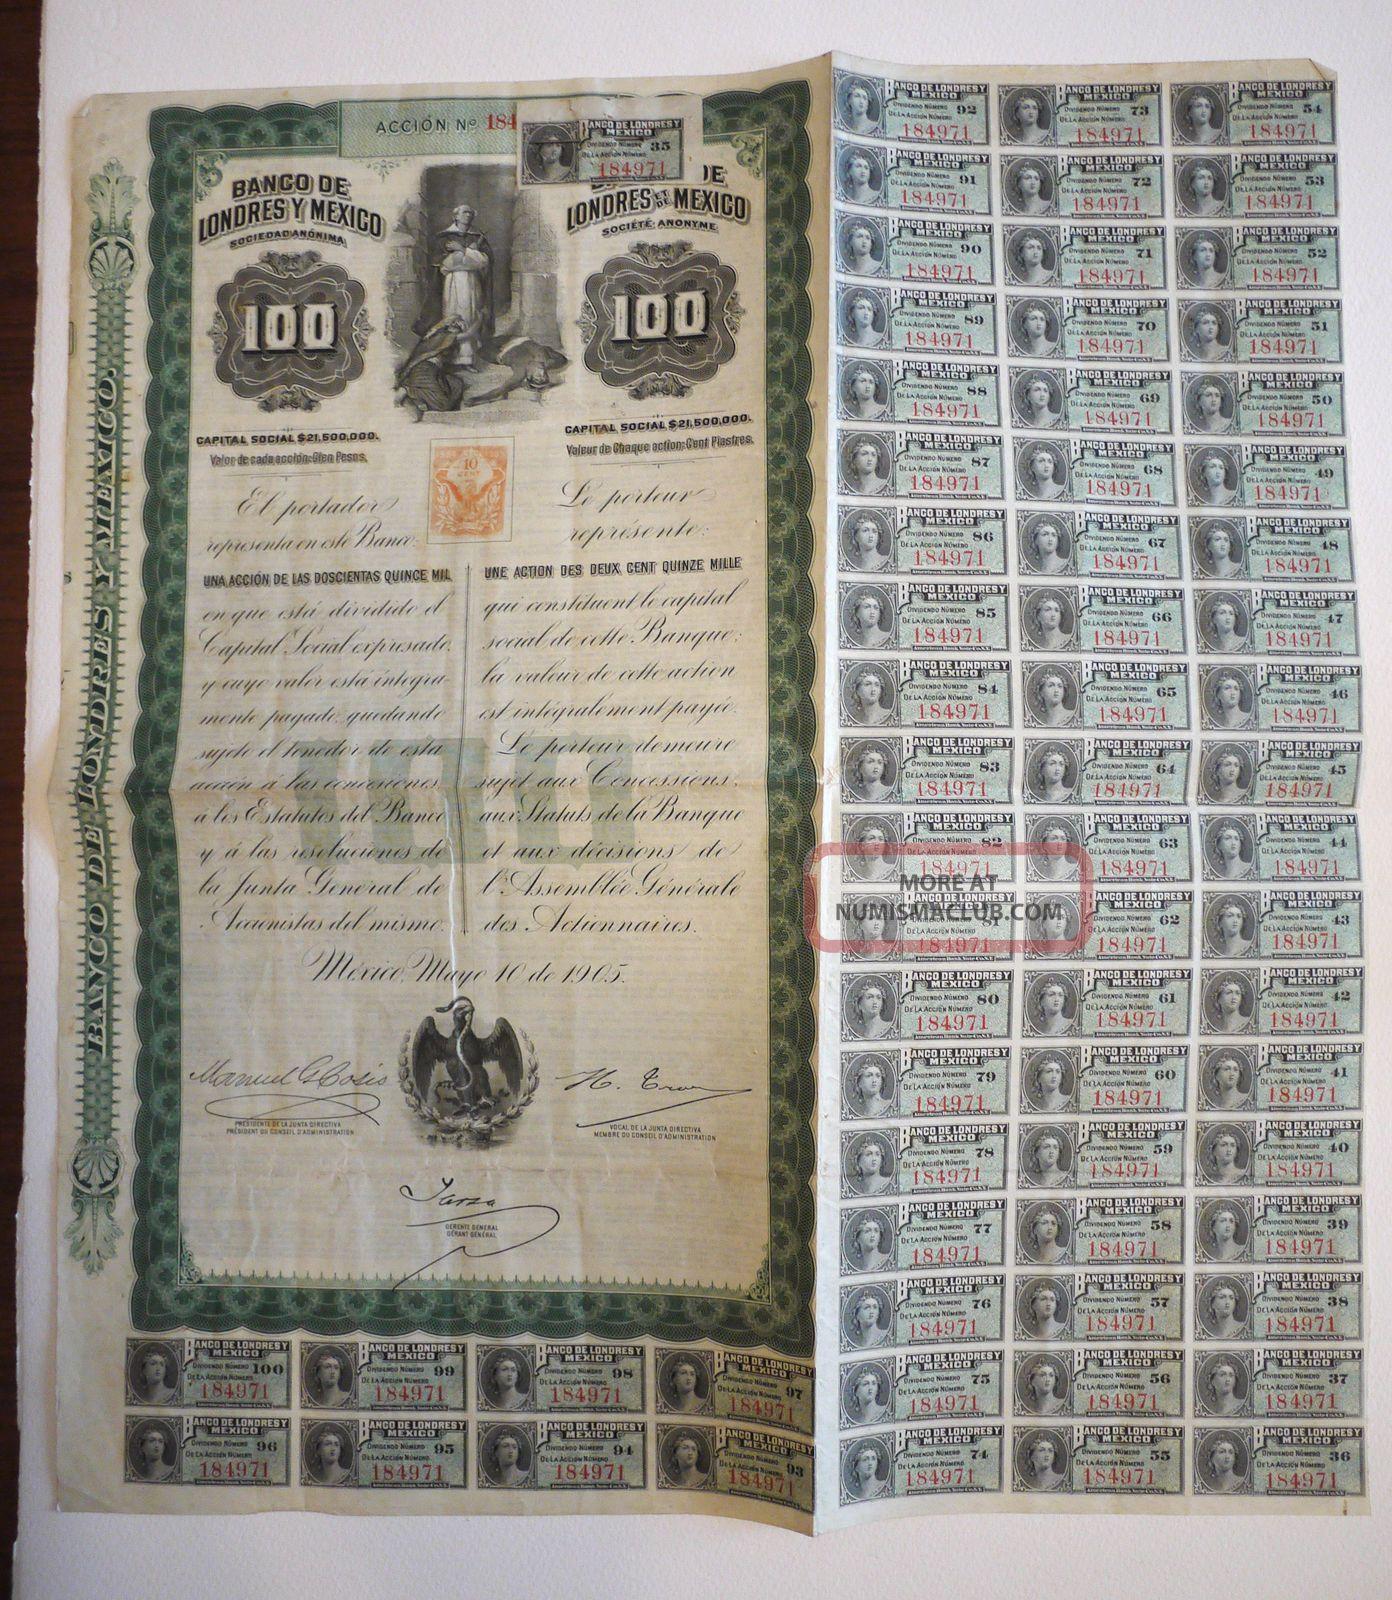 Banco De Londres Y Mexico Victoria Queen 100$ Green 1905 With 66 Coupons. Stocks & Bonds, Scripophily photo